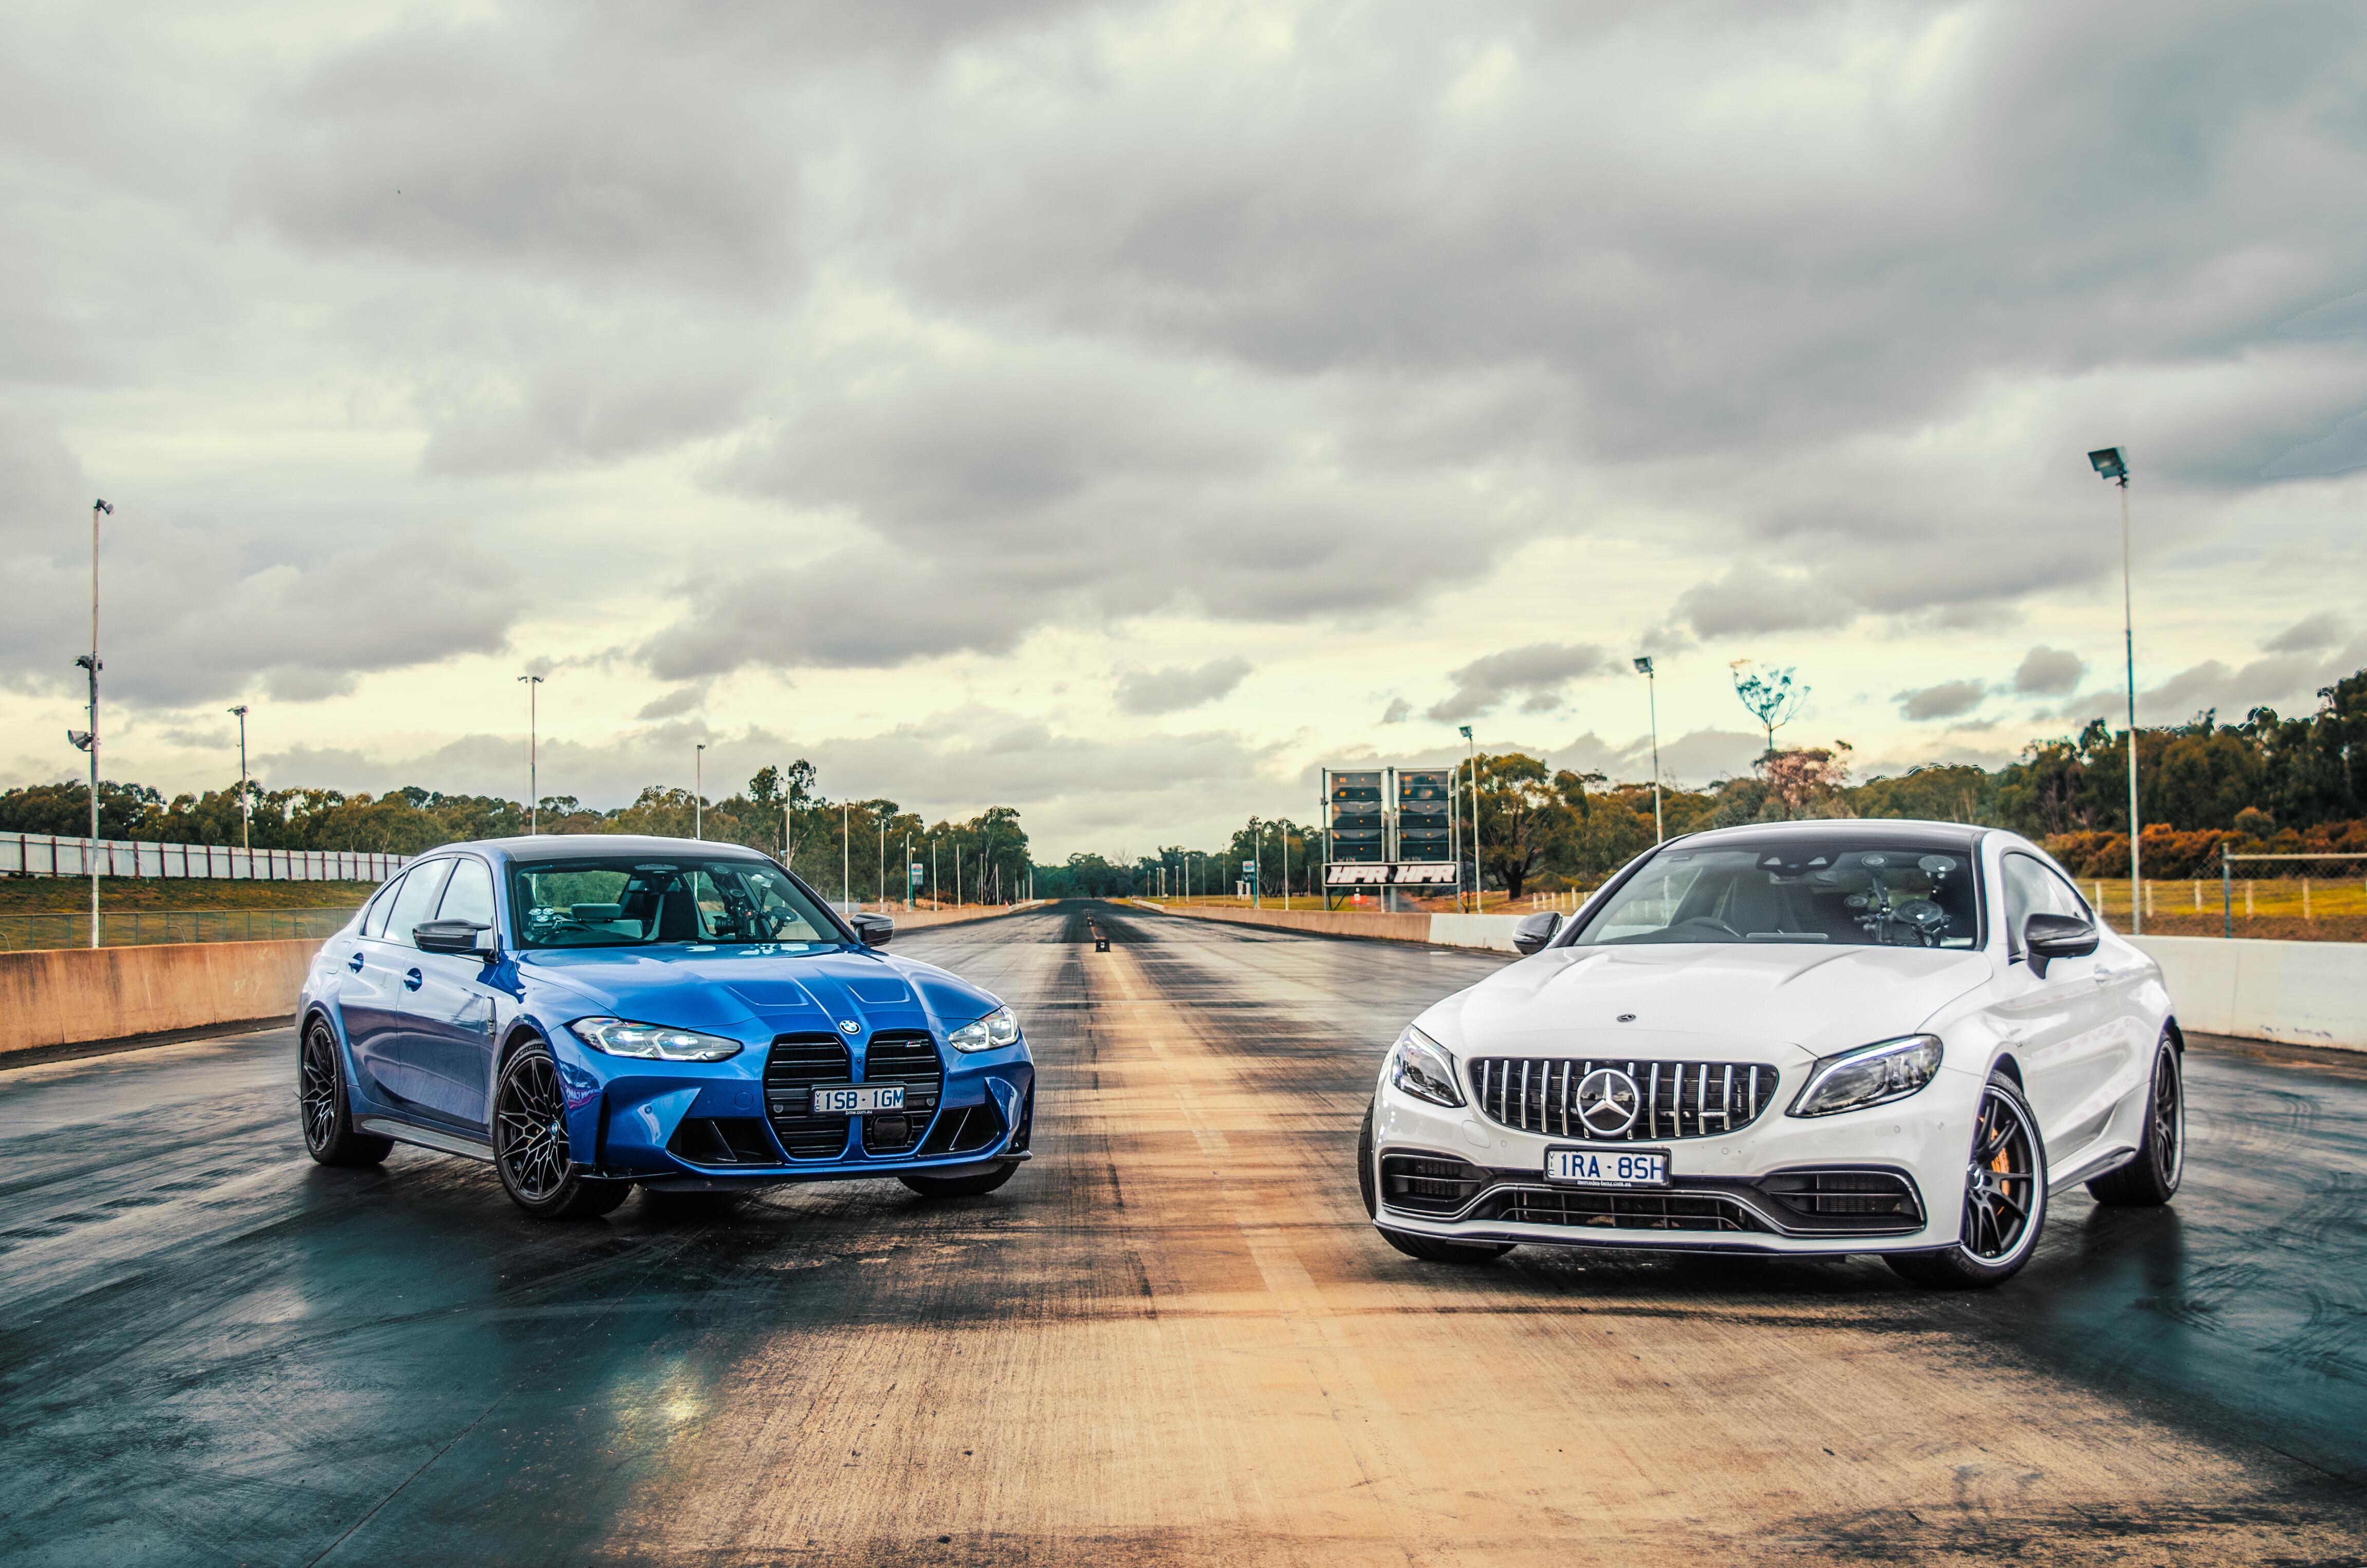 2021 BMW M3 Competition v Mercedes-AMG C63 S drag race